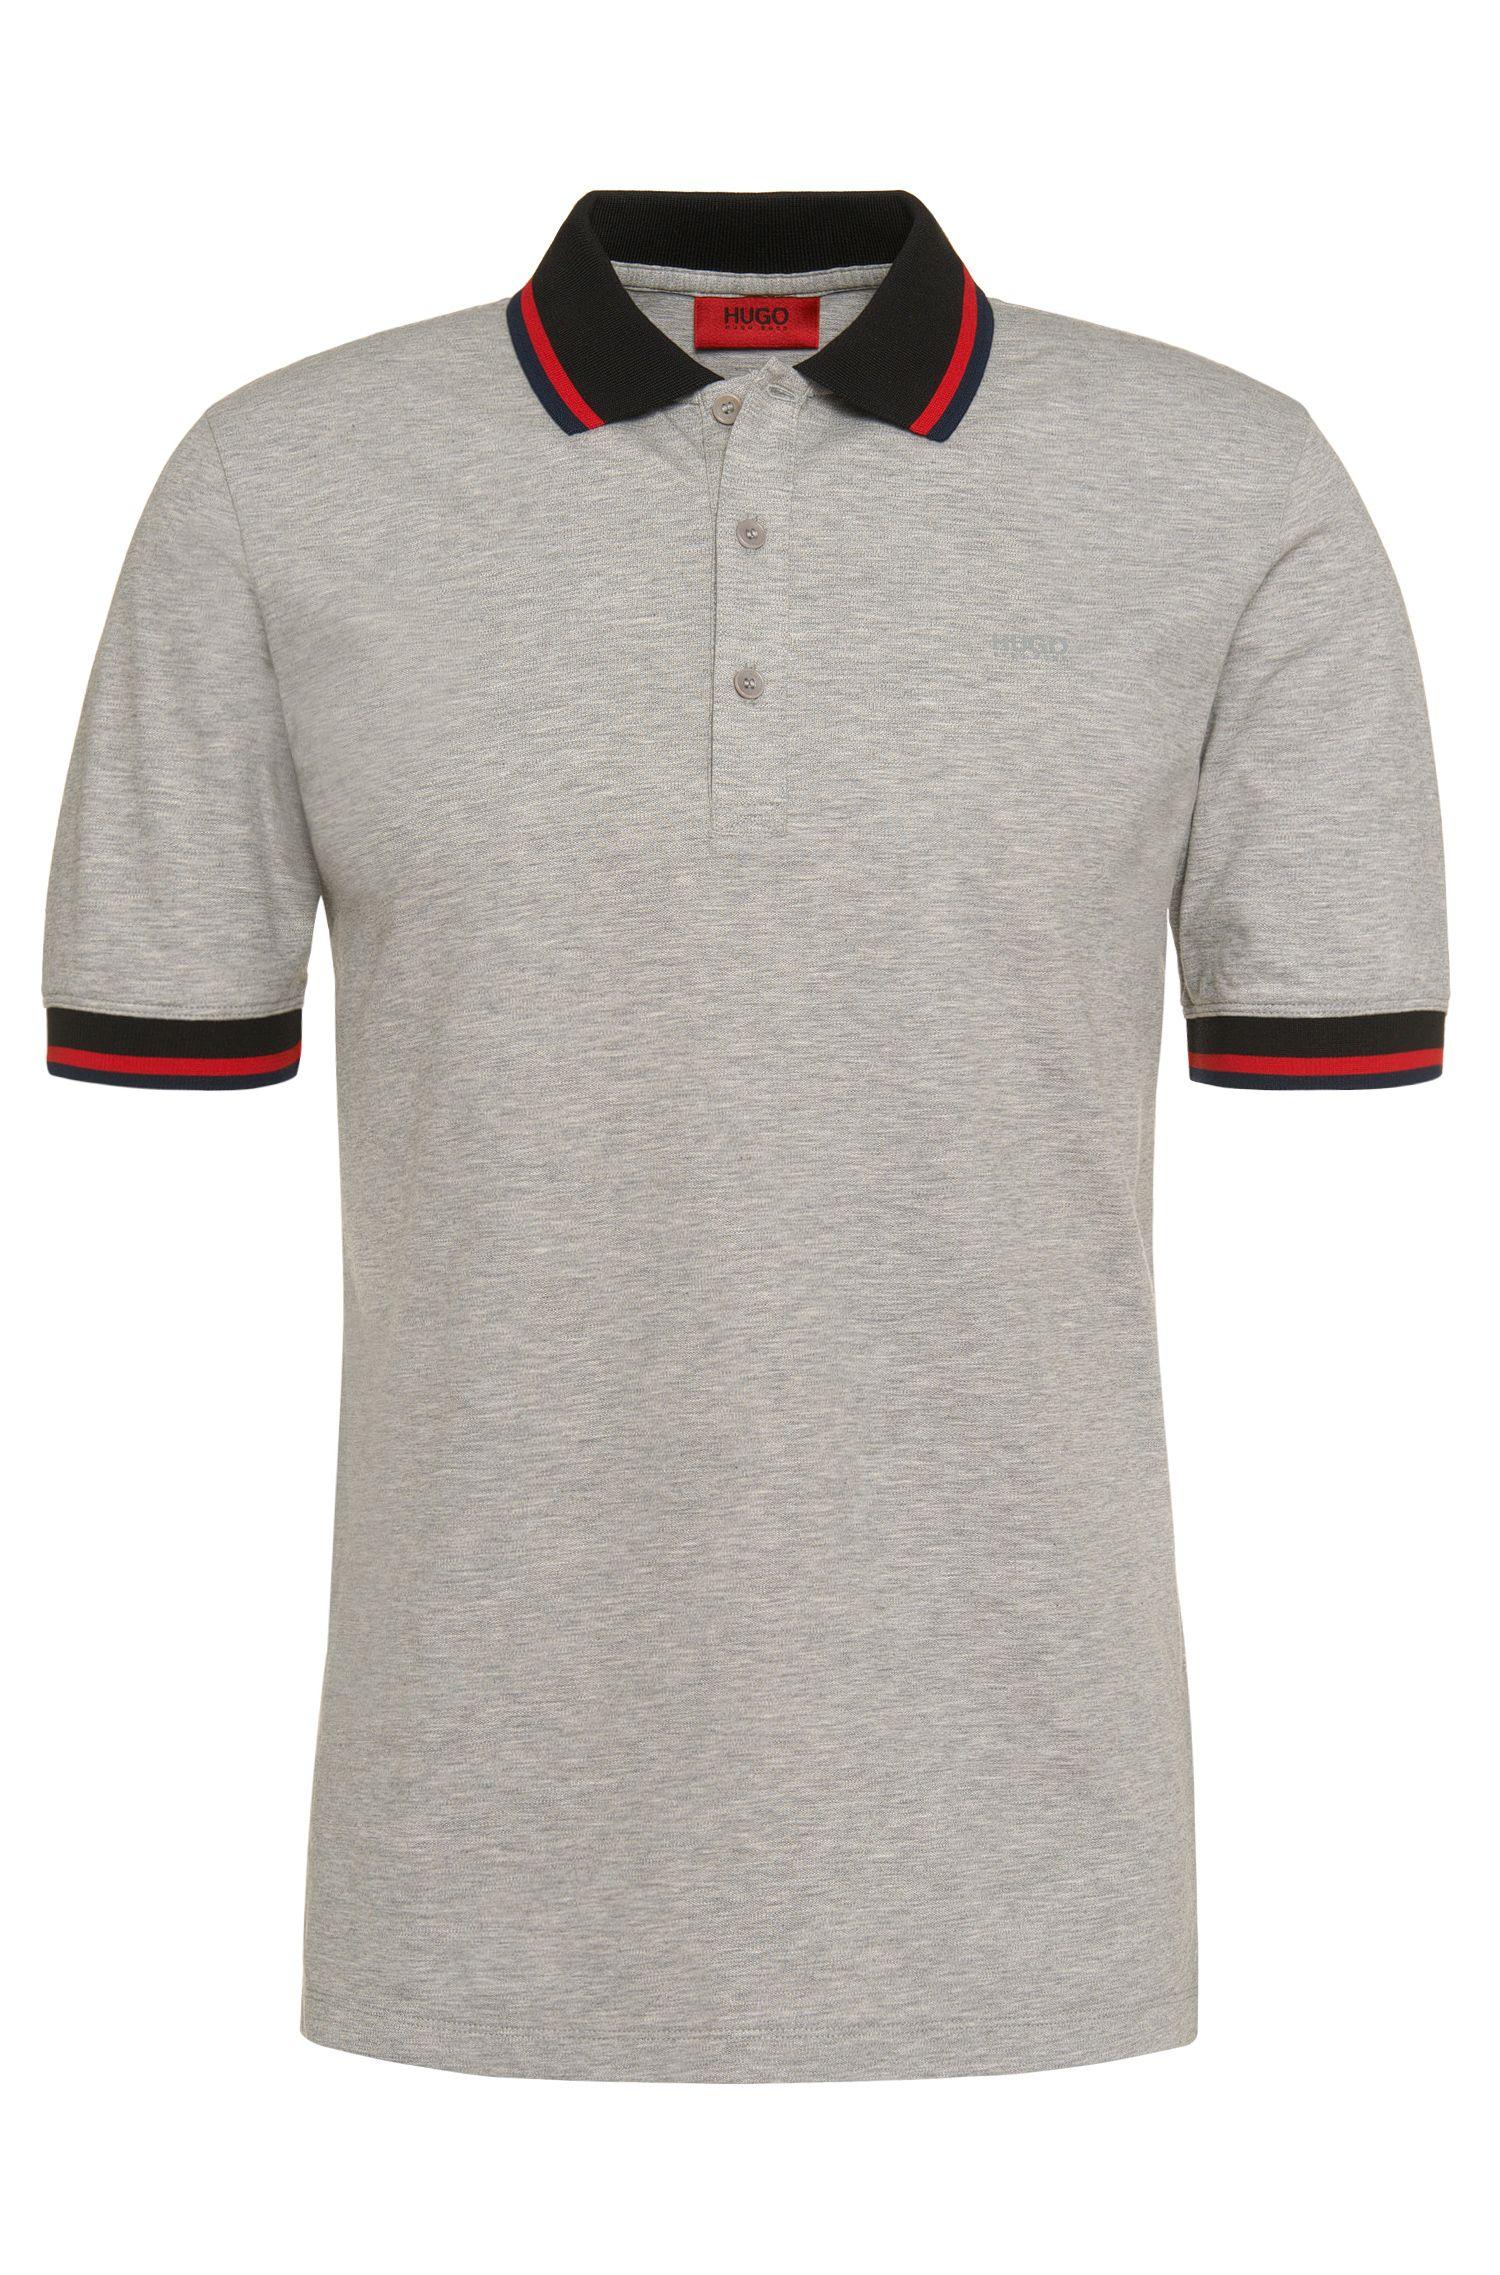 Regular-Fit Poloshirt aus Stretch-Baumwolle: 'Darese'